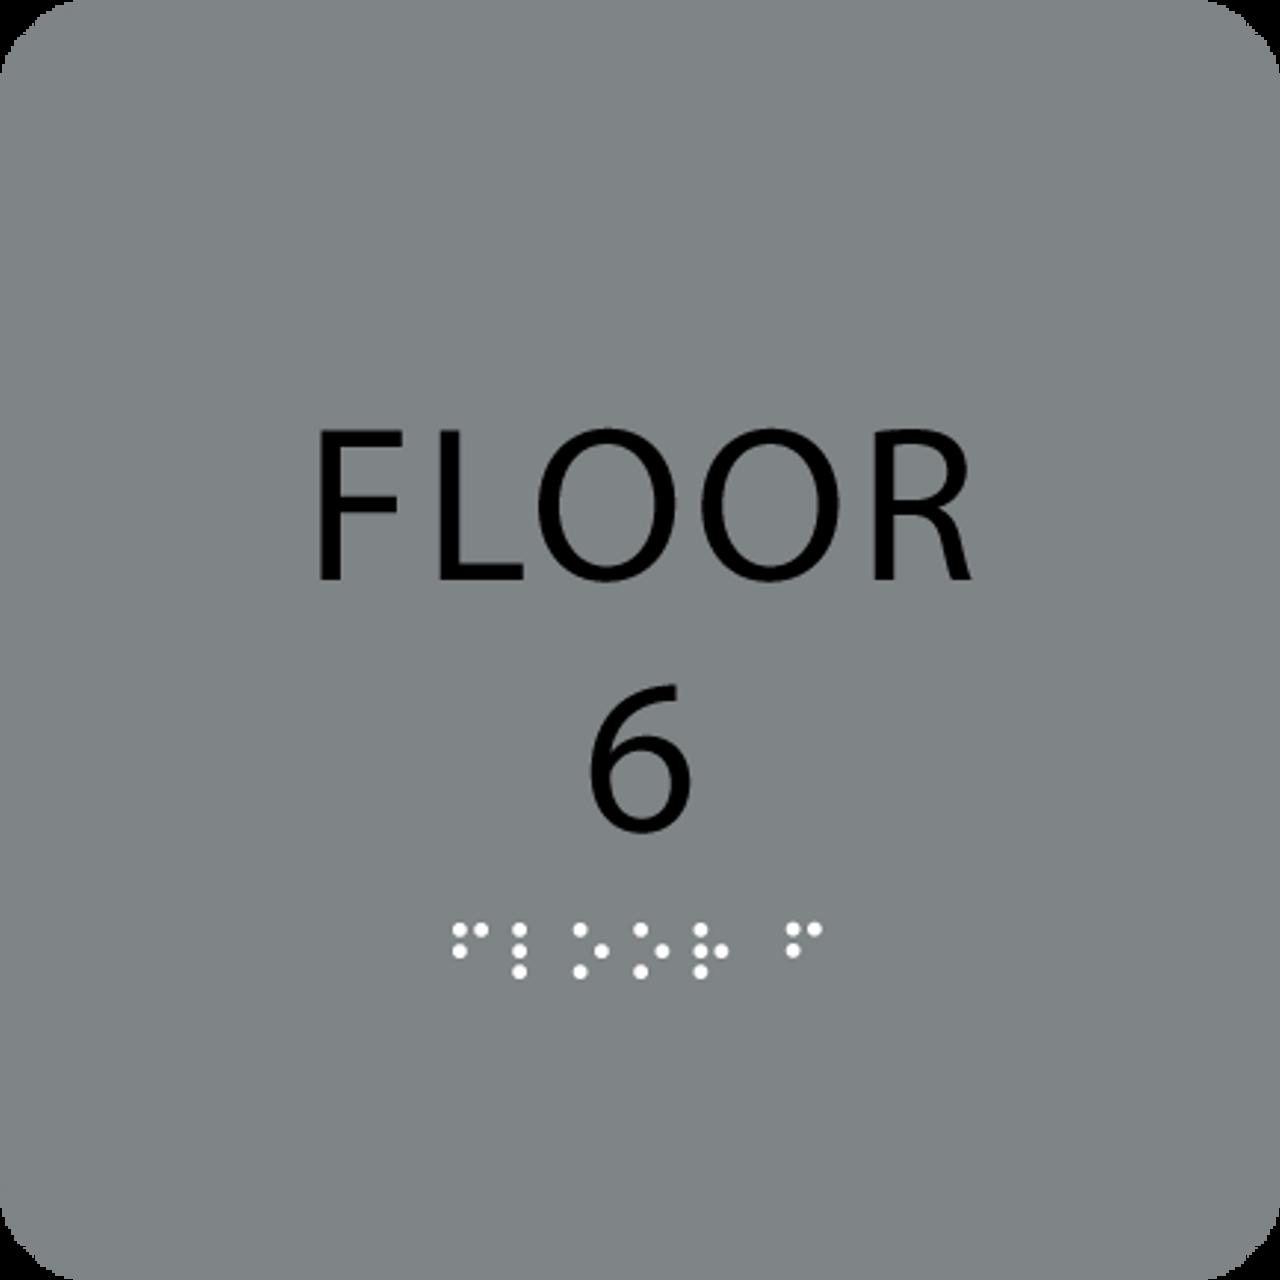 Grey Floor 6 Level Identification ADA Sign